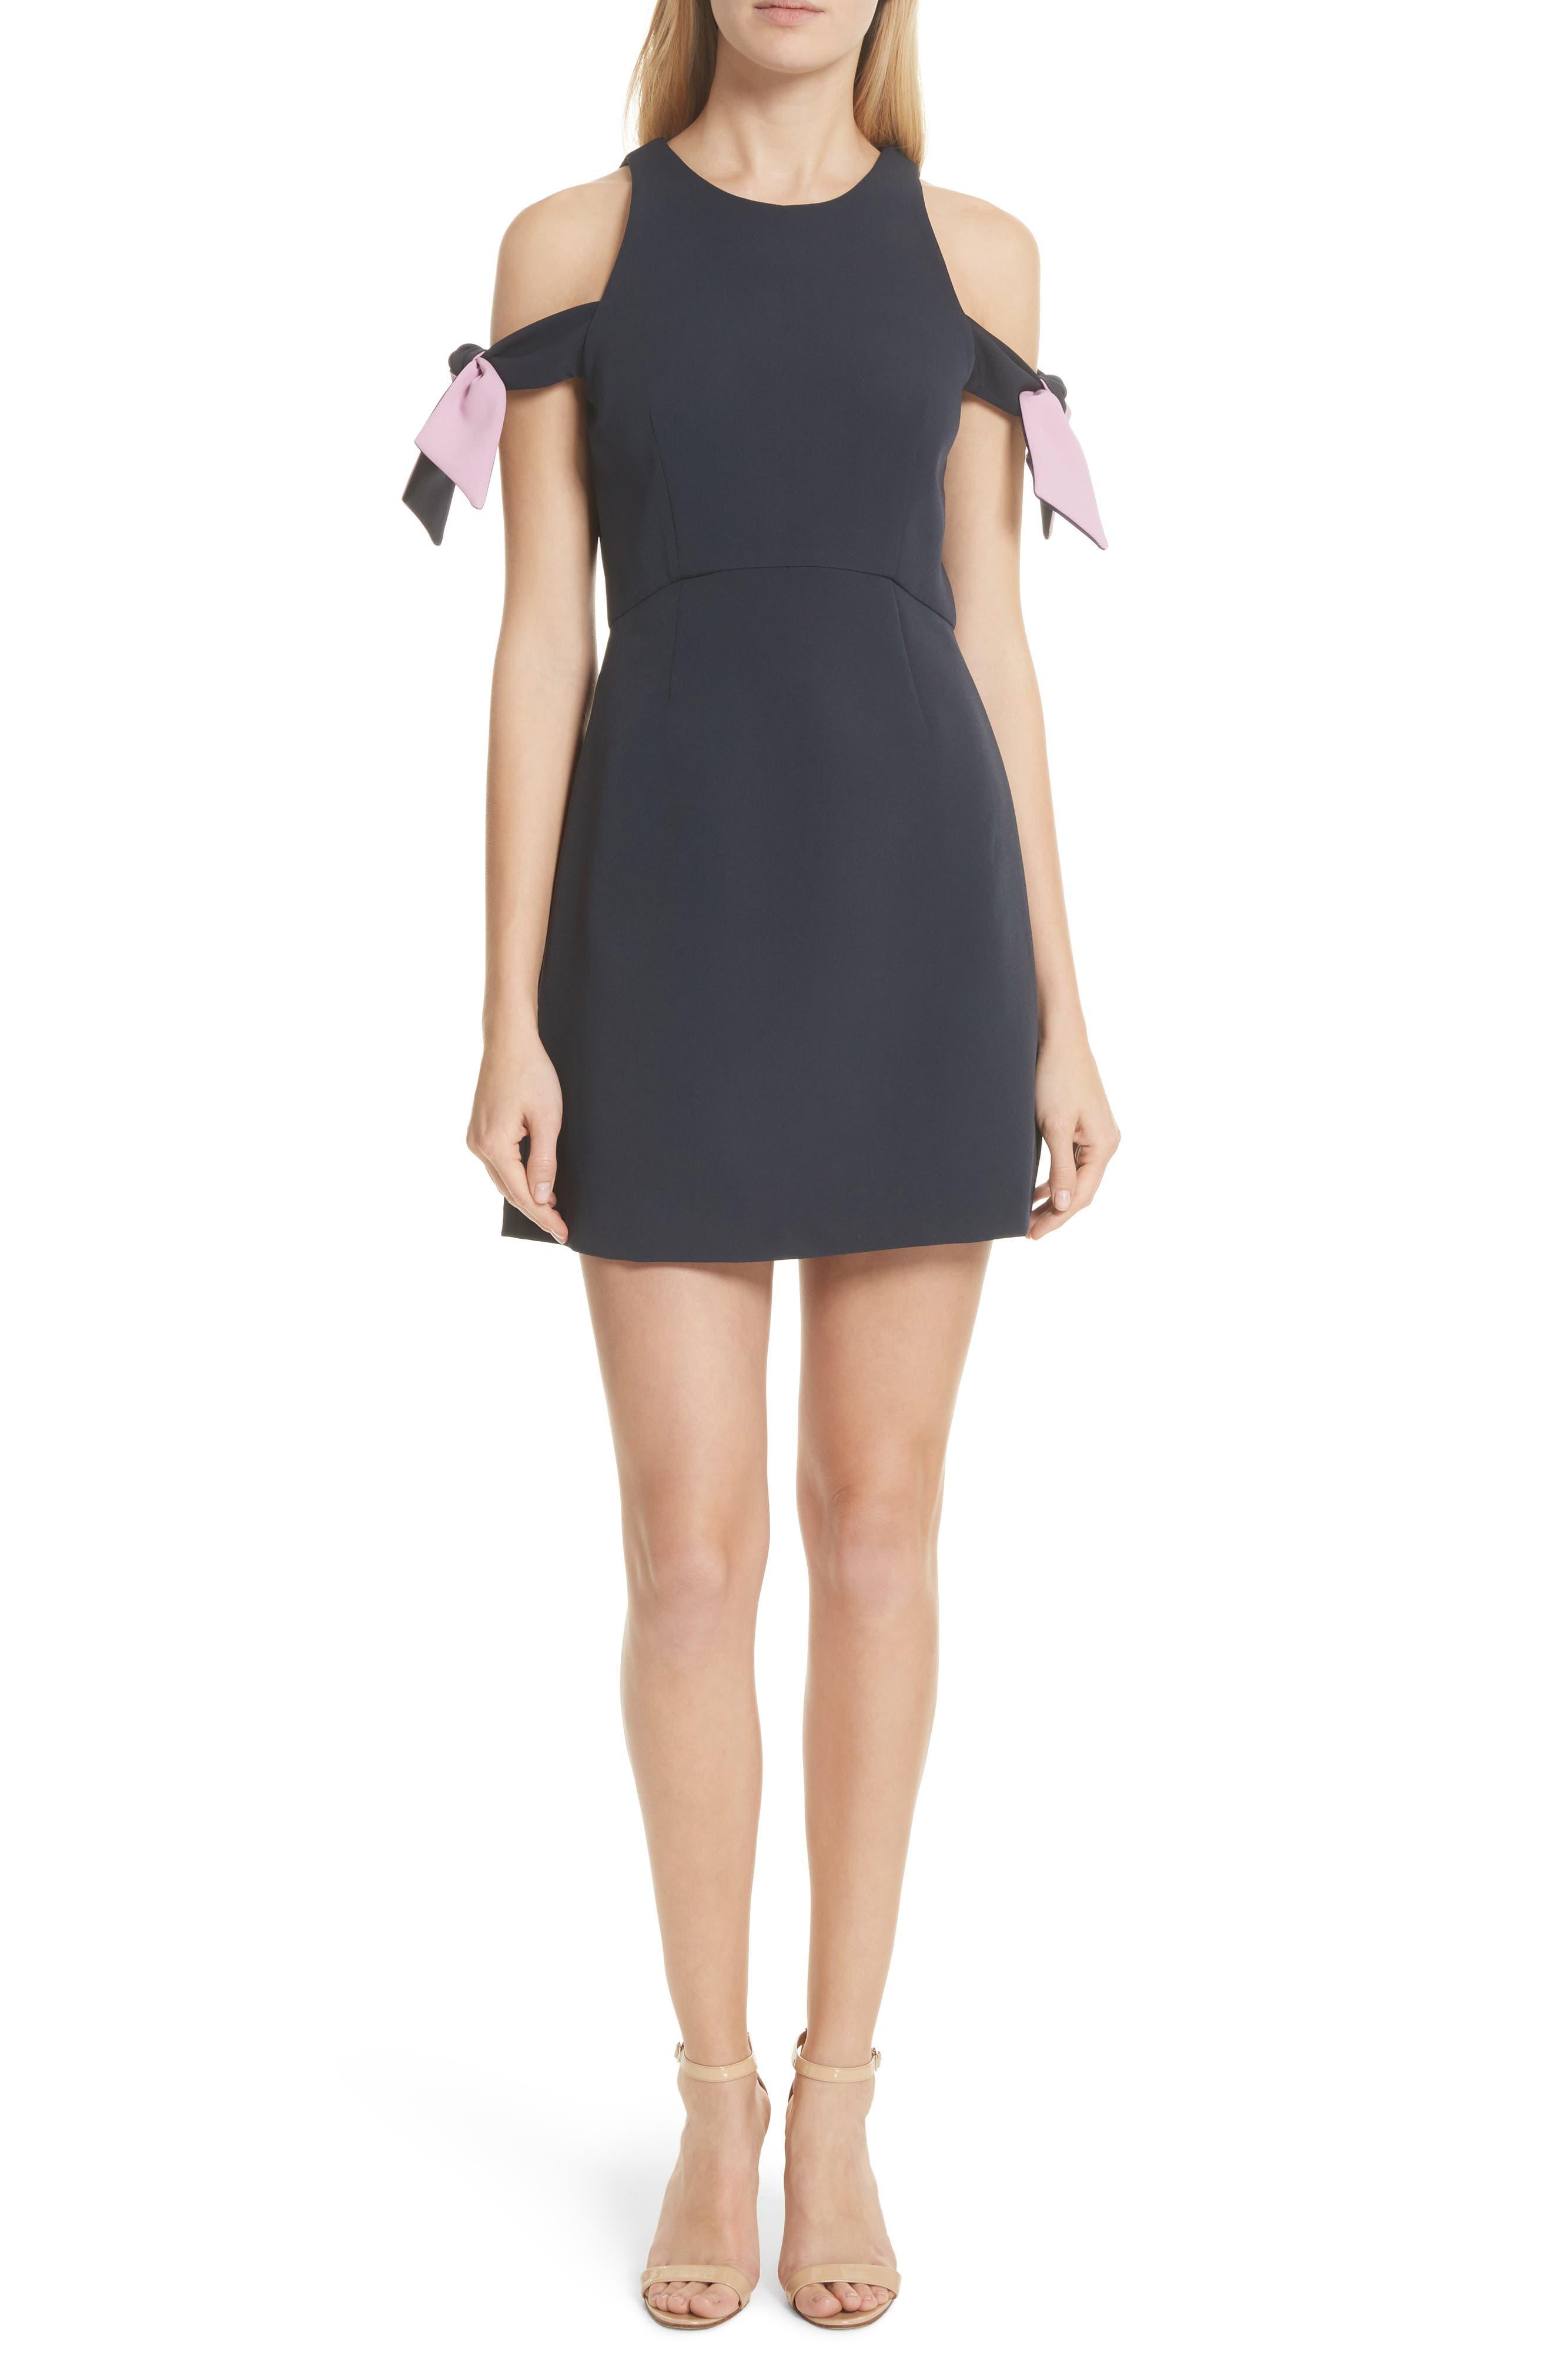 Alternate Image 1 Selected - Milly Madison Cold Shoulder Minidress